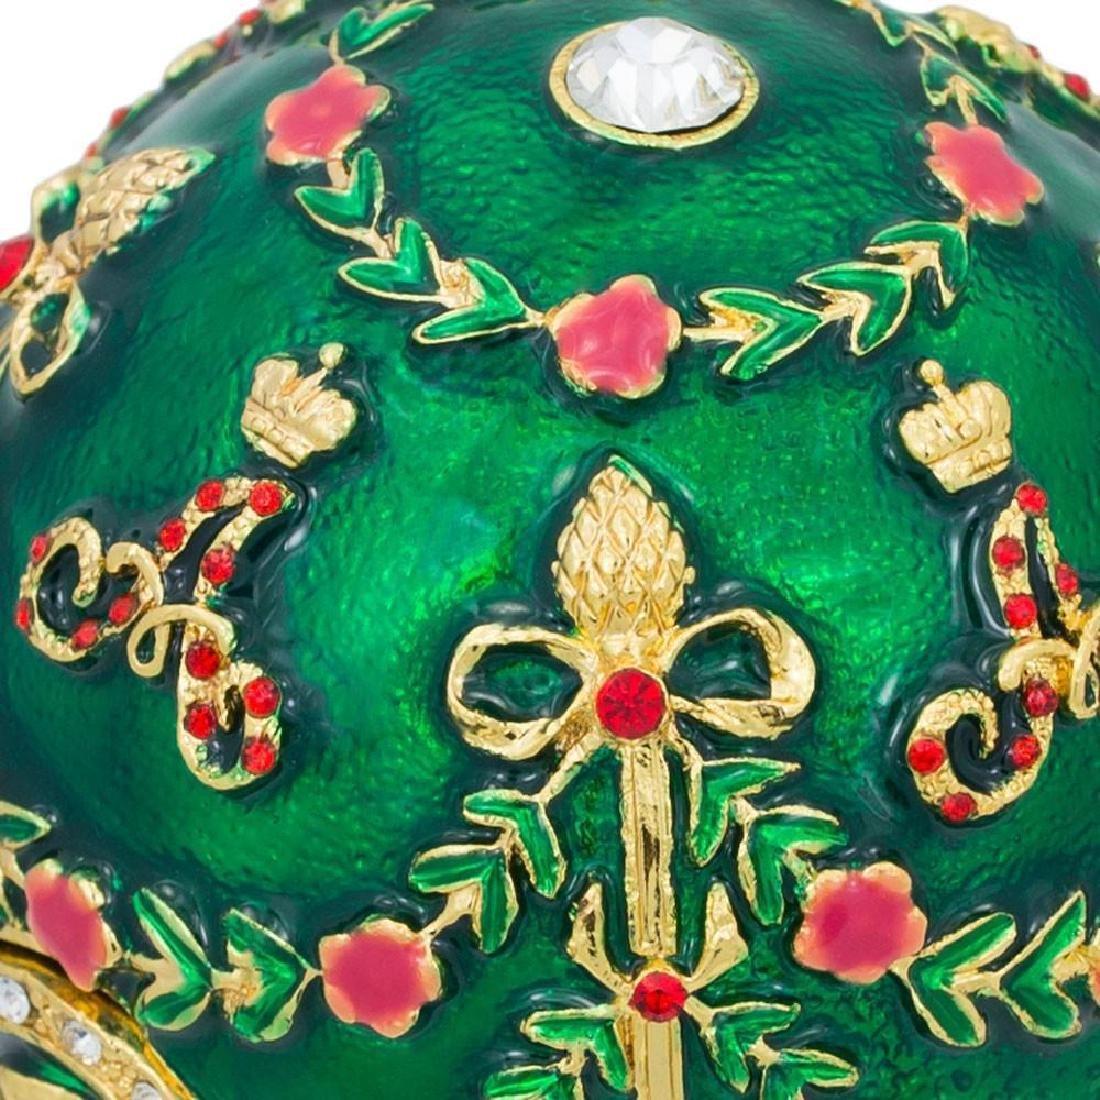 Faberge Inspired 1908 Alexander Palace Faberge Egg - 7